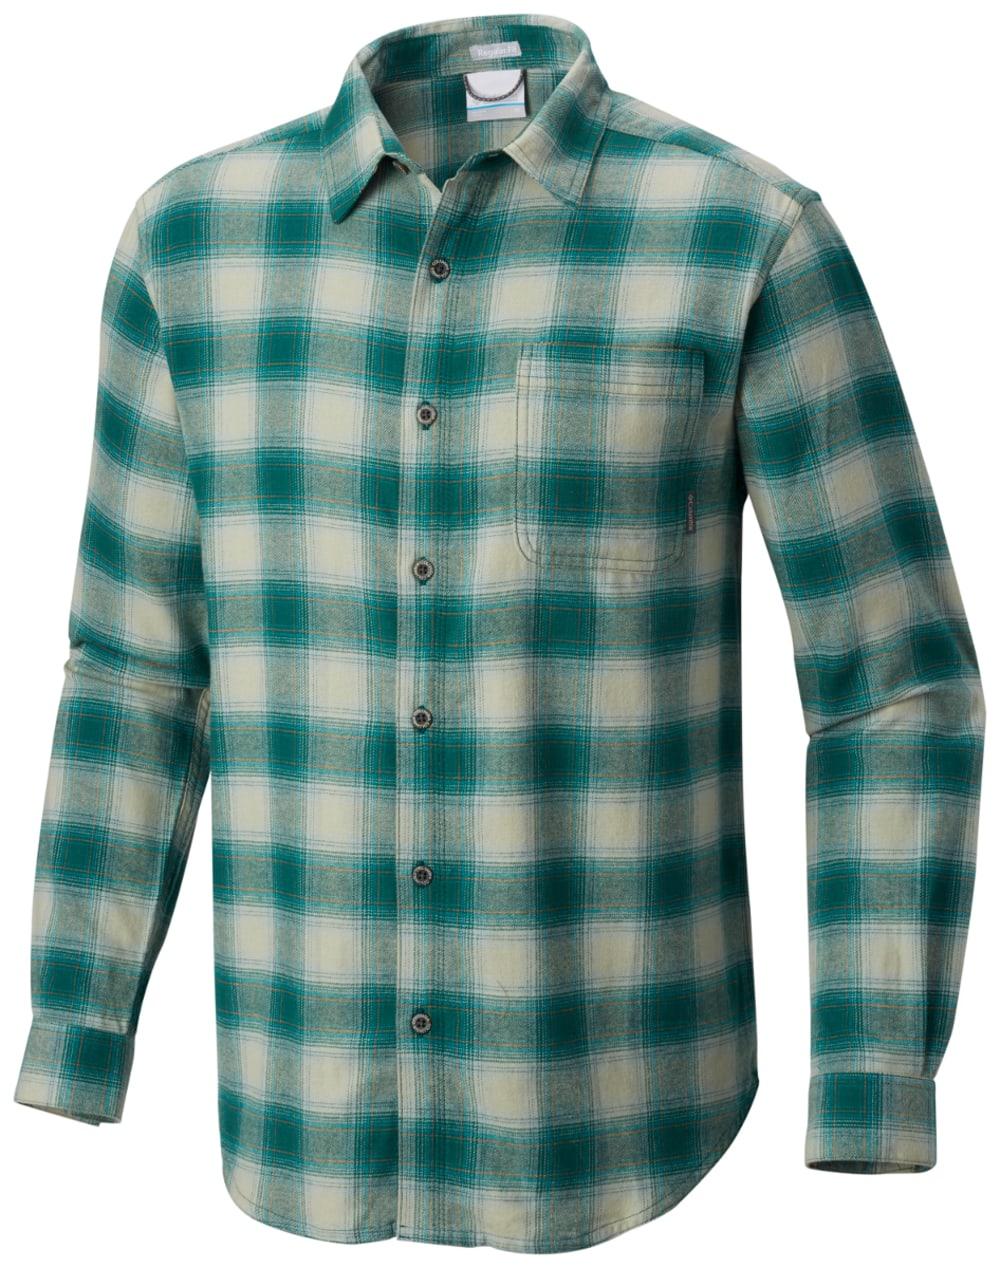 COLUMBIA Men's Boulder Ridge Long-Sleeve Flannel Shirt - DARK IVY POP PLD-399